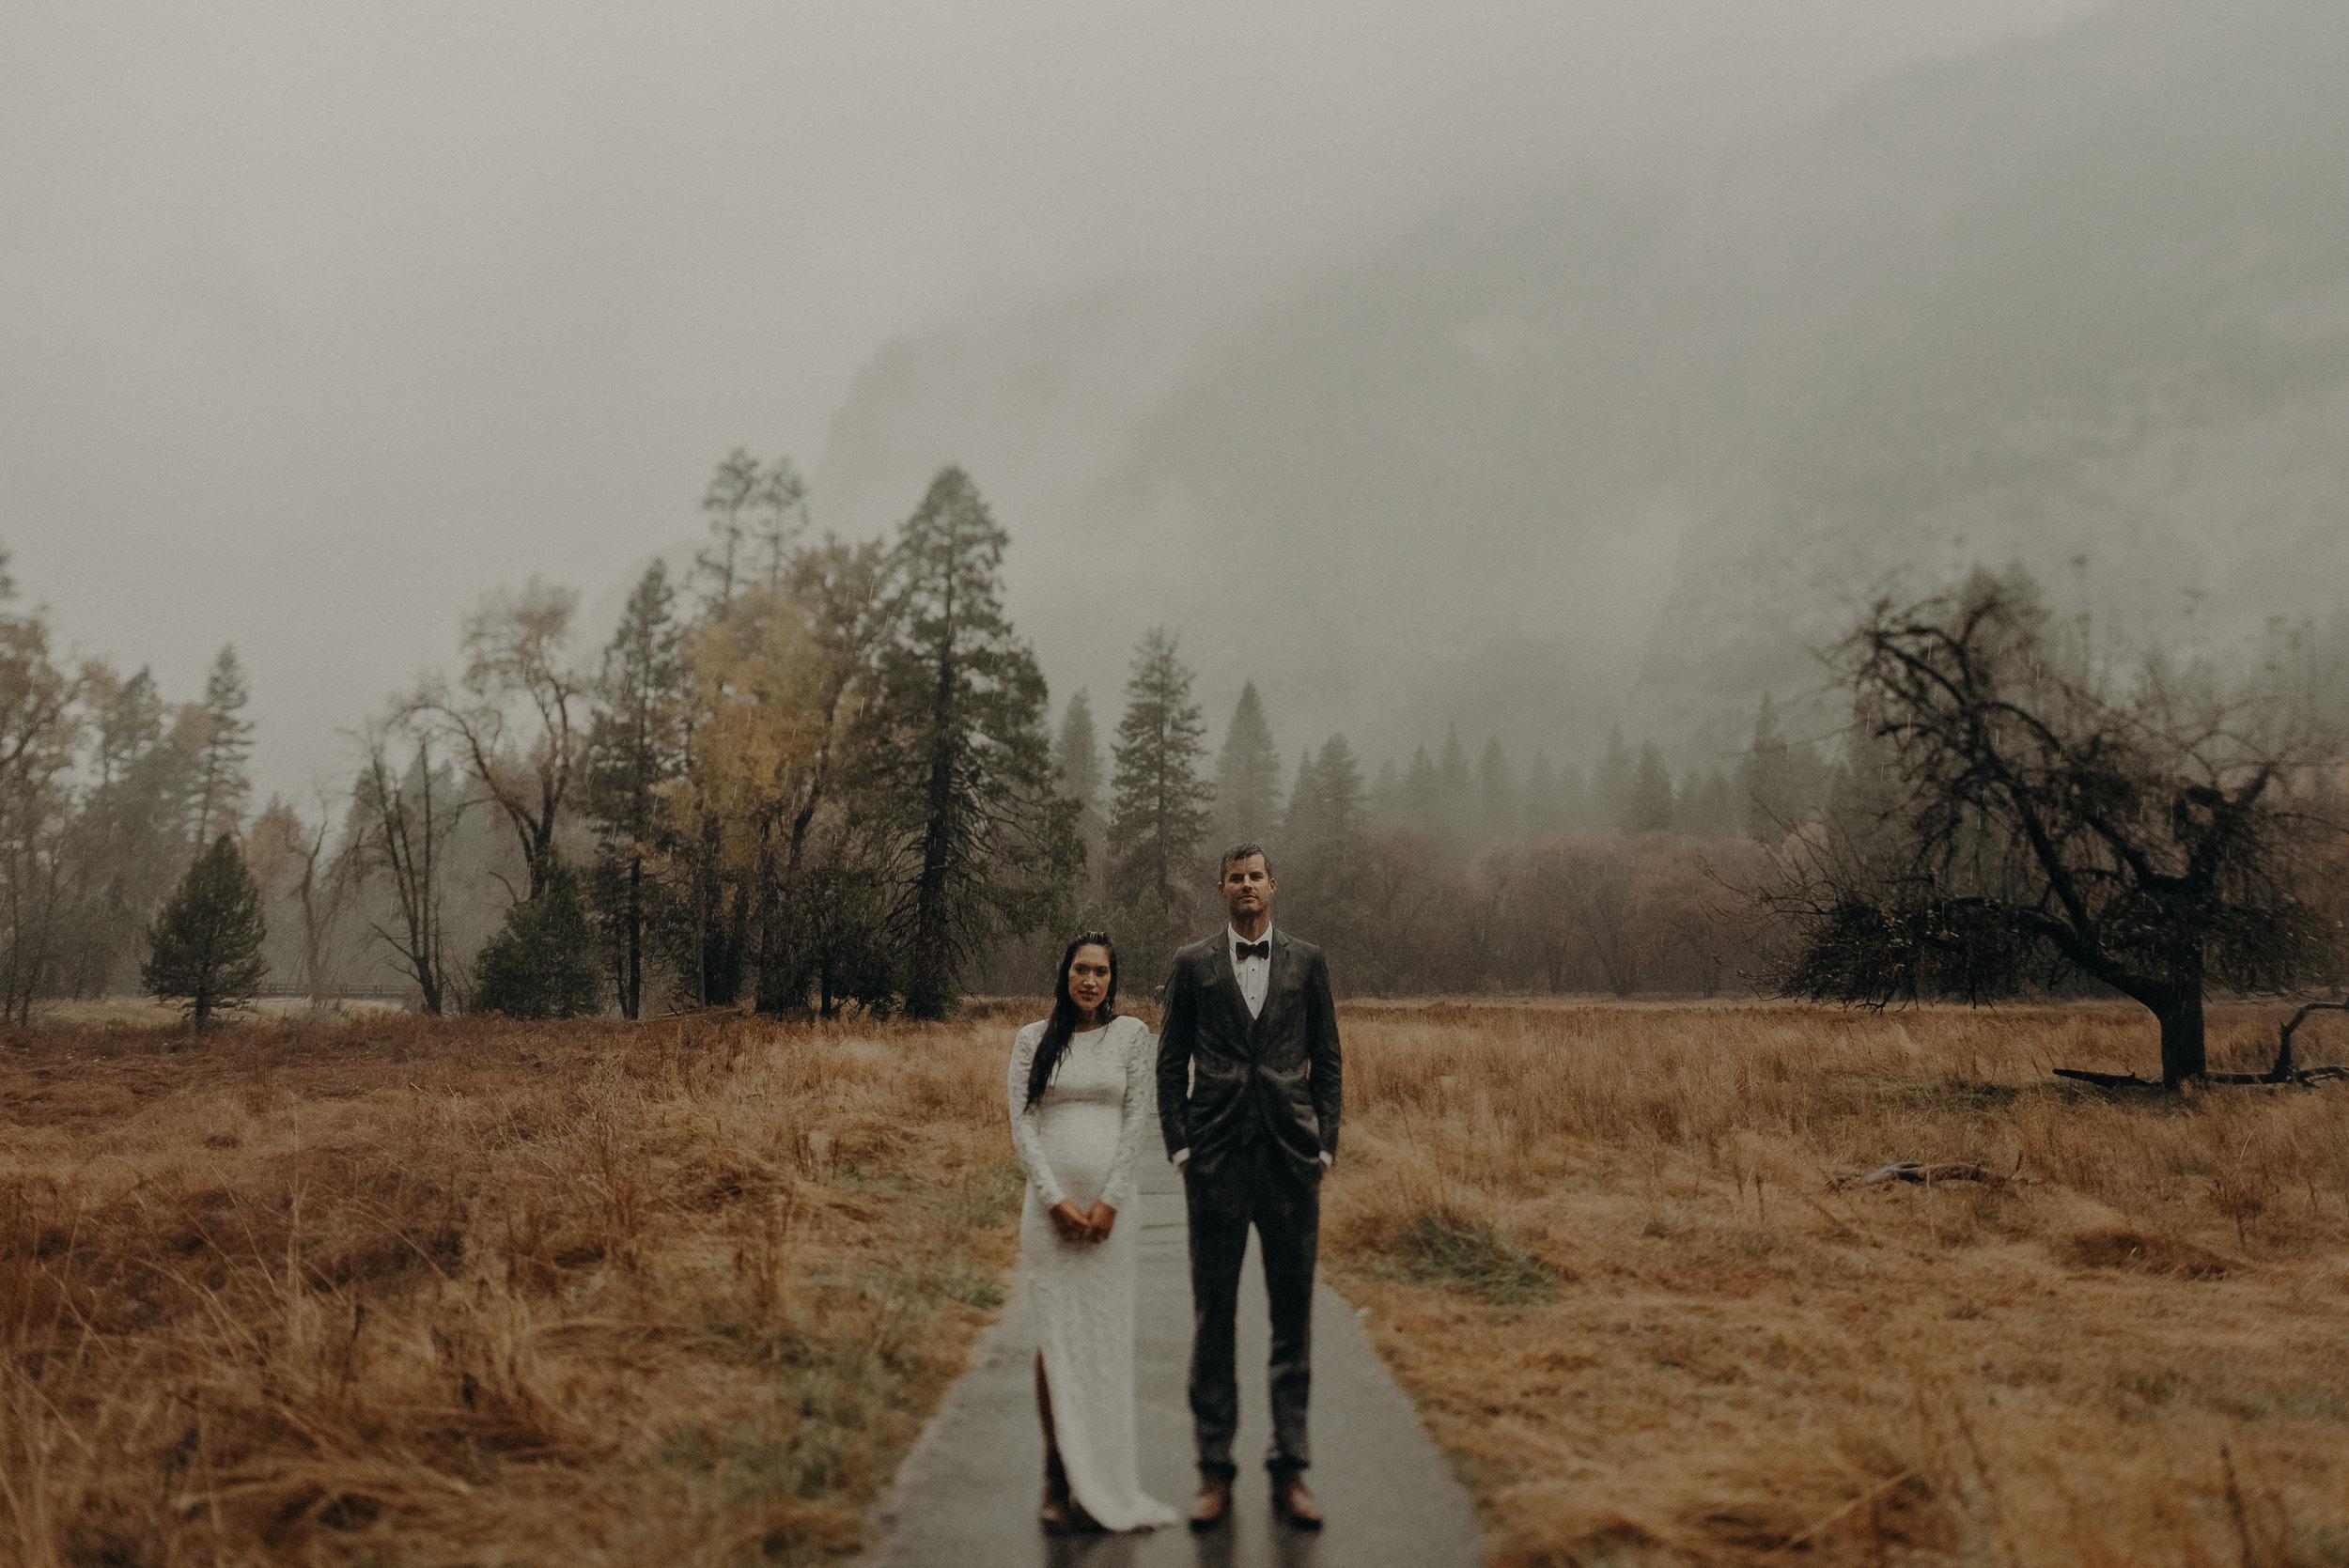 Isaiah + Taylor Photography - Yosemite Elopement - Los Angeles Wedding Photographer-76.jpg